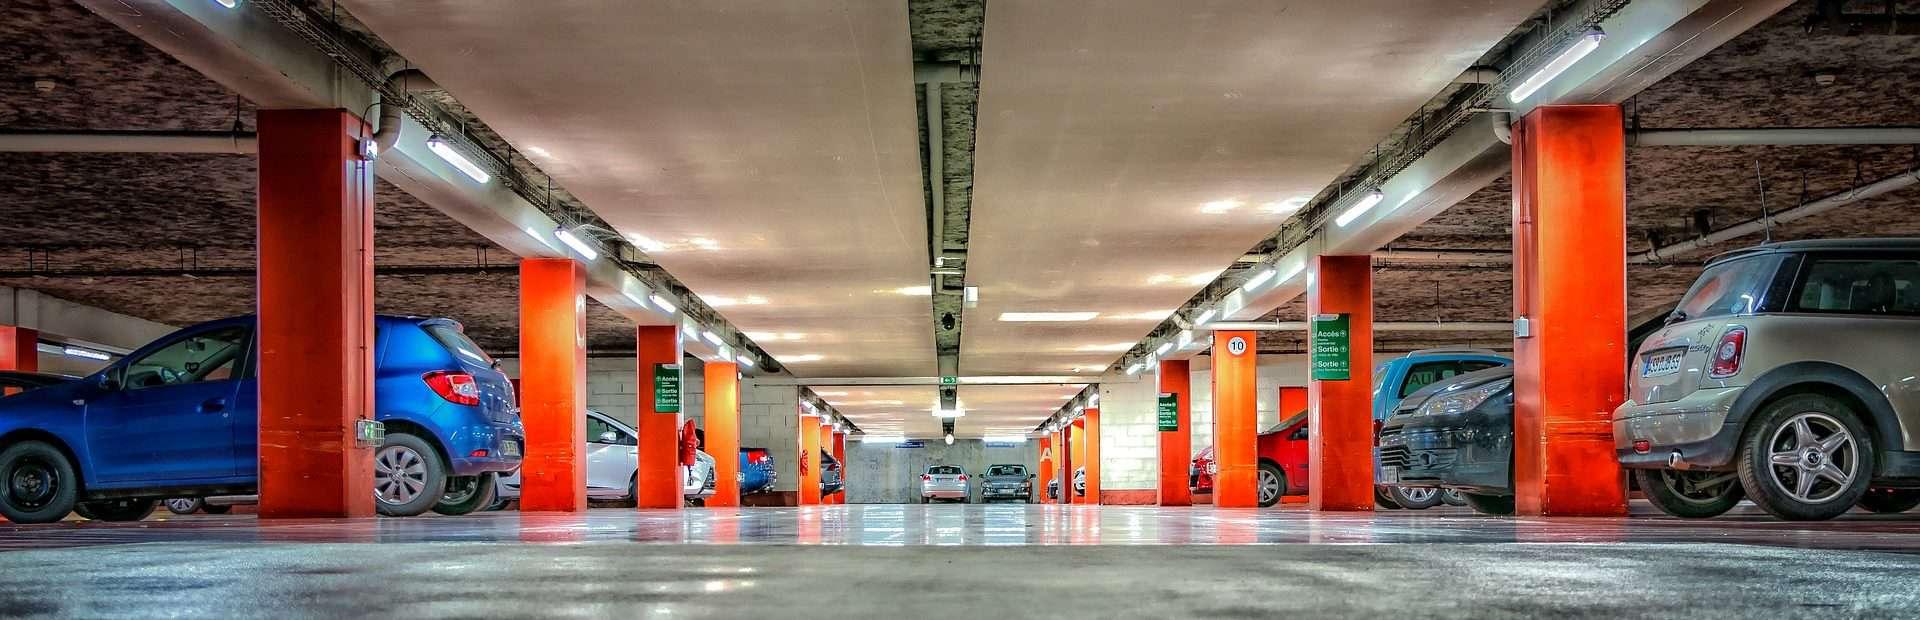 Parking lotnisko Modlin od kuchni